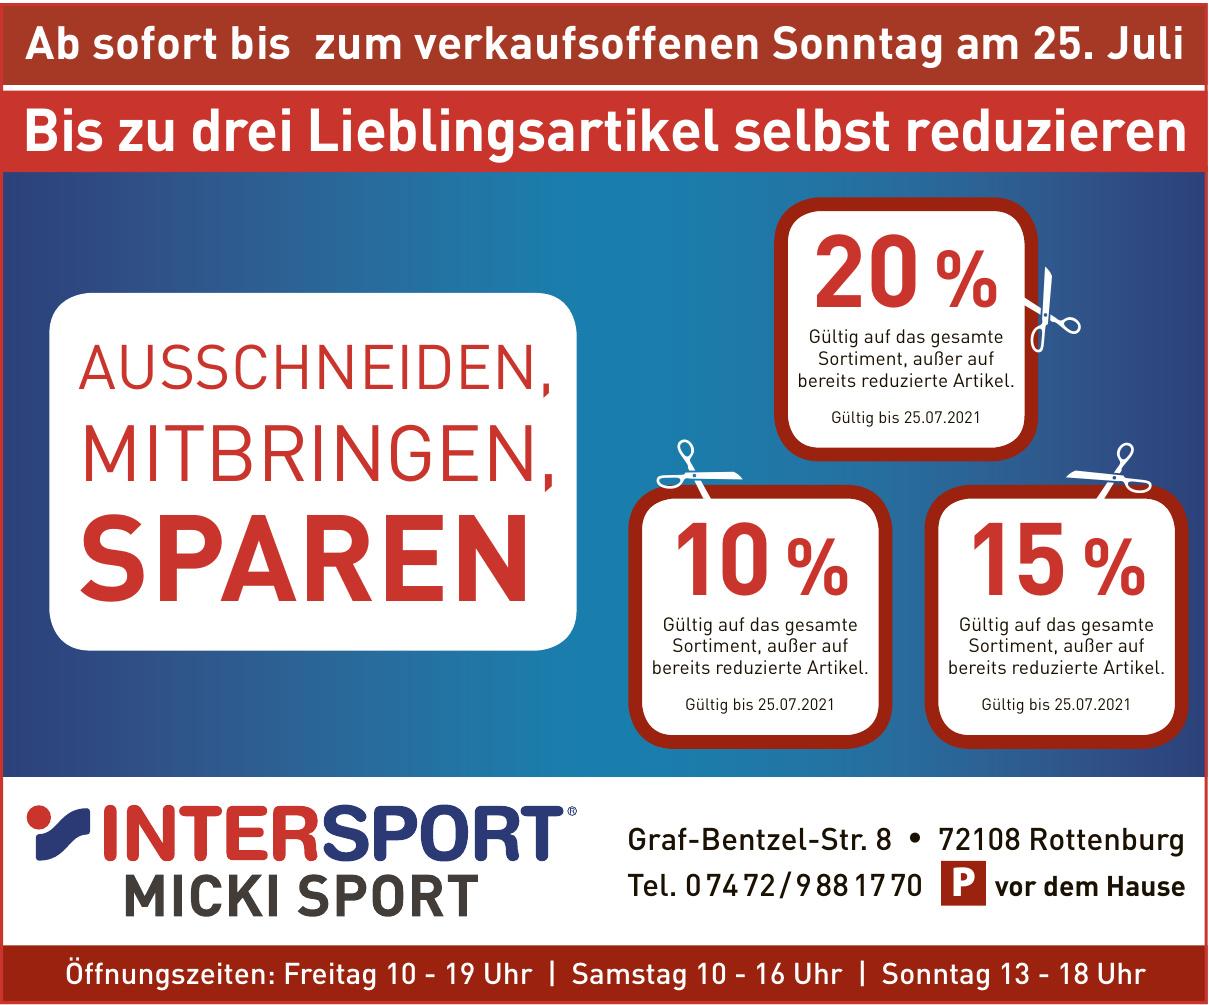 Intersport Micki Sport